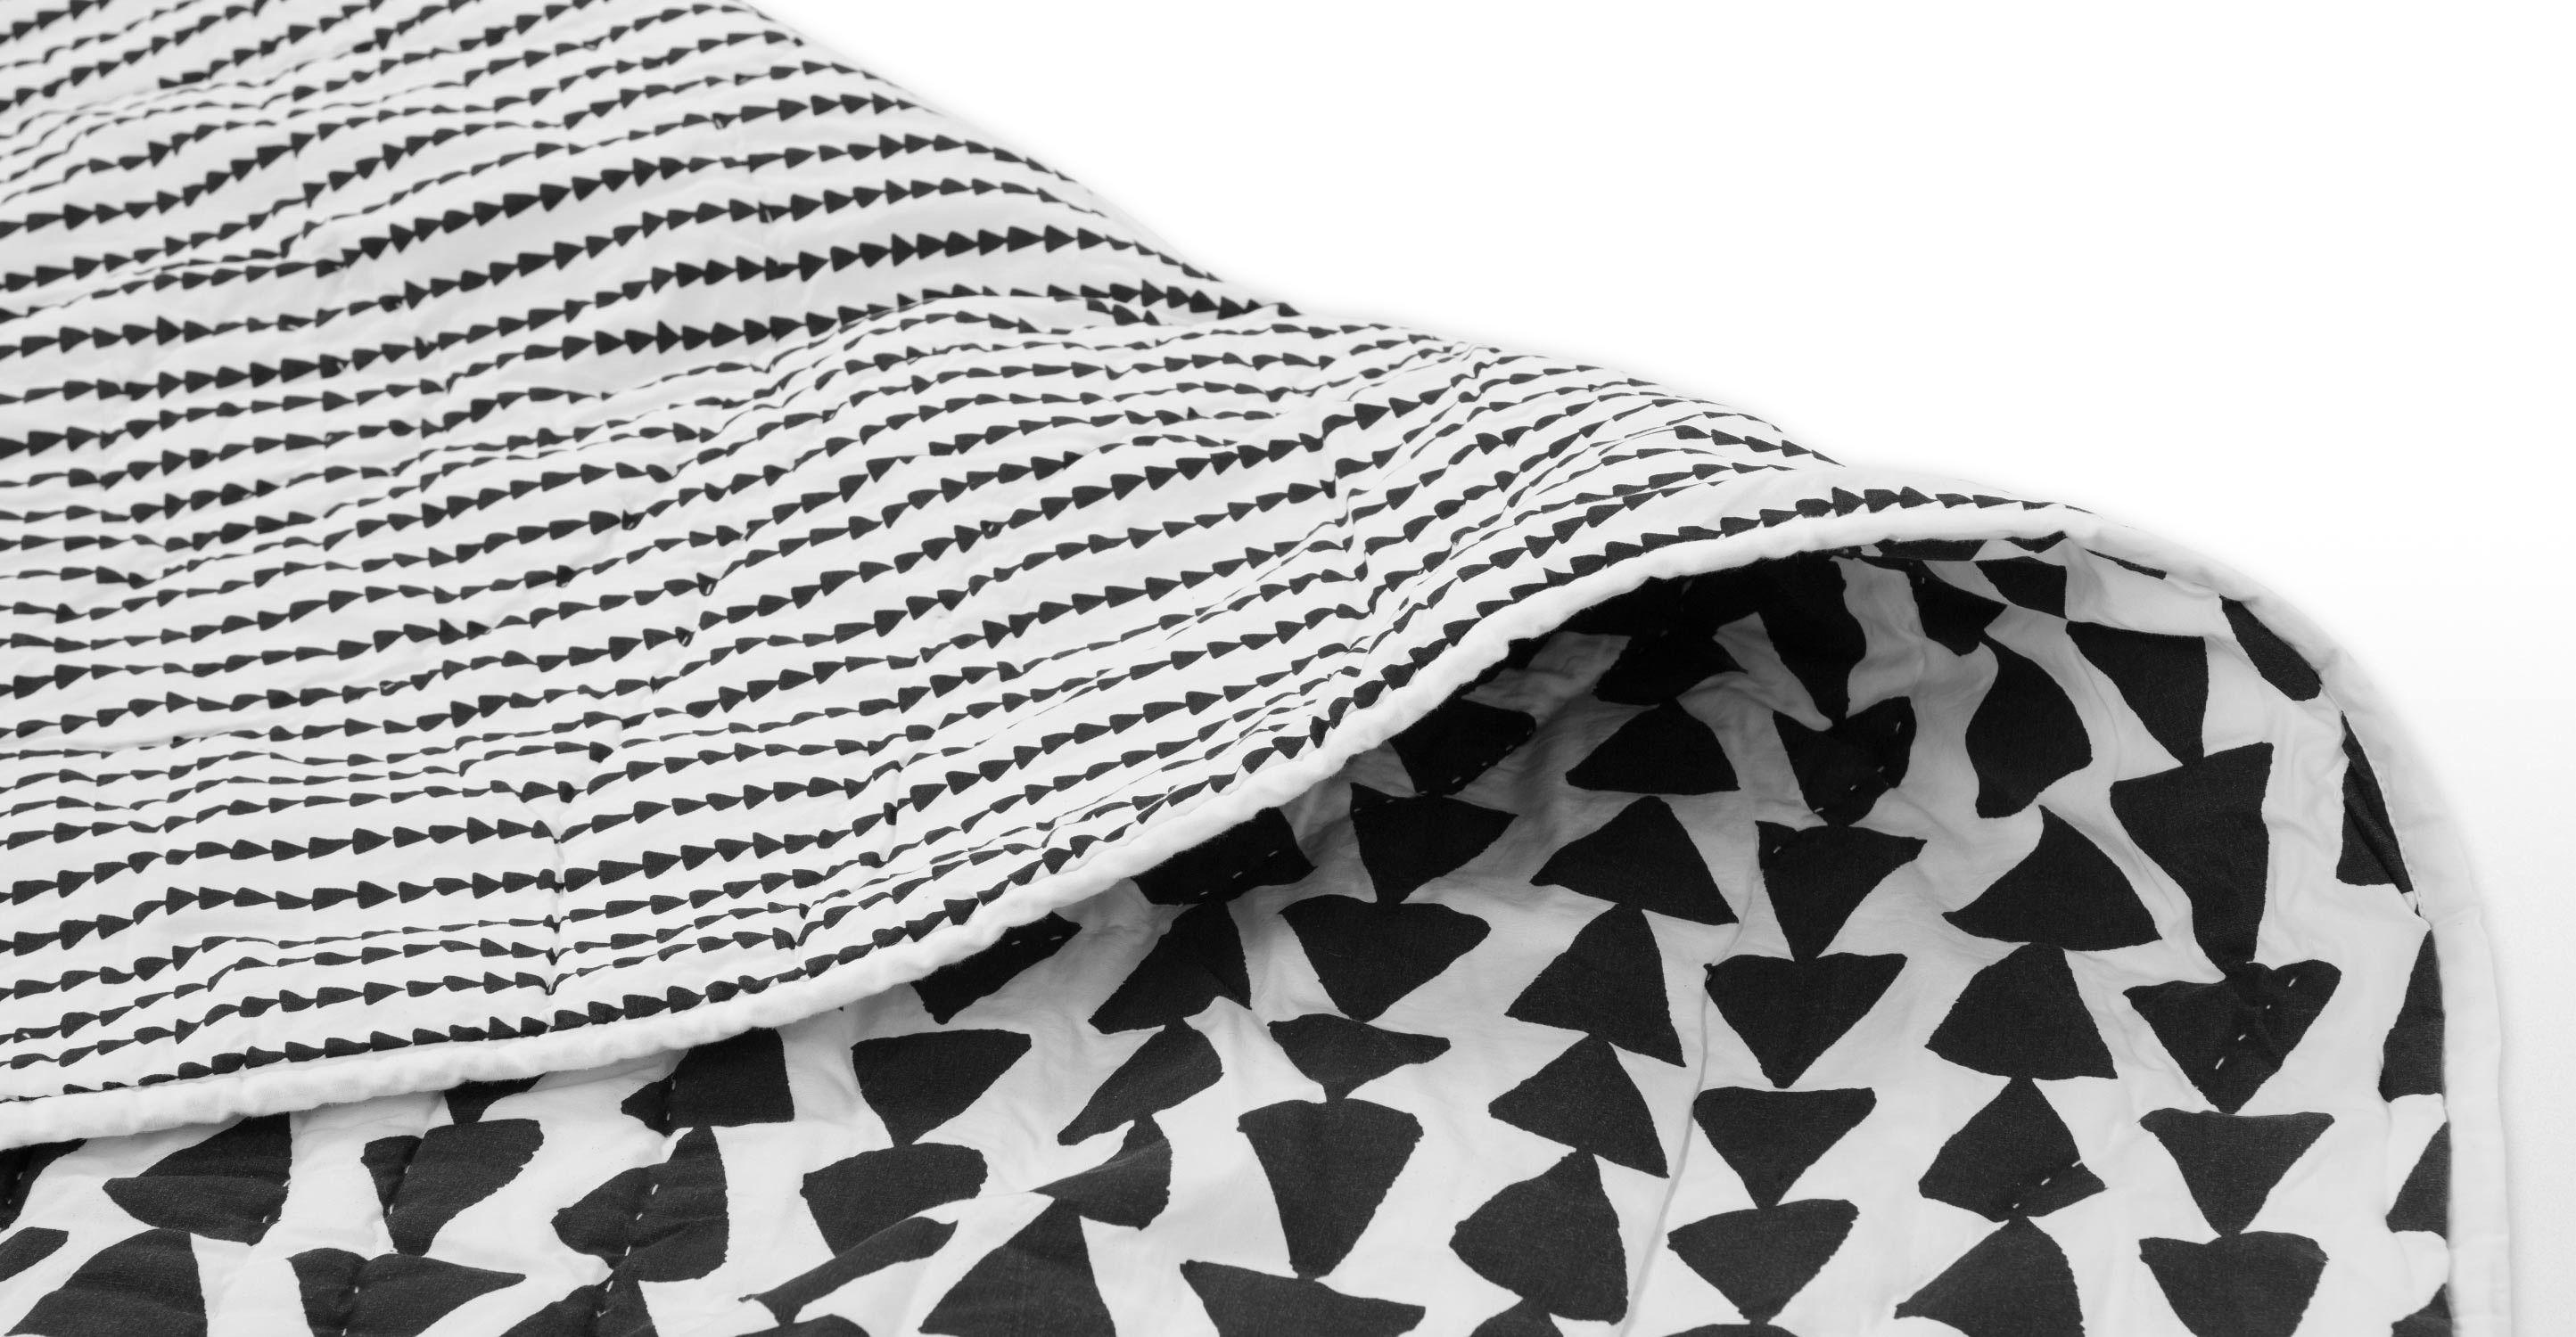 iso 180 x 130cm tagesdecke f r kinder schwarzwei stars kalle pinterest bed. Black Bedroom Furniture Sets. Home Design Ideas